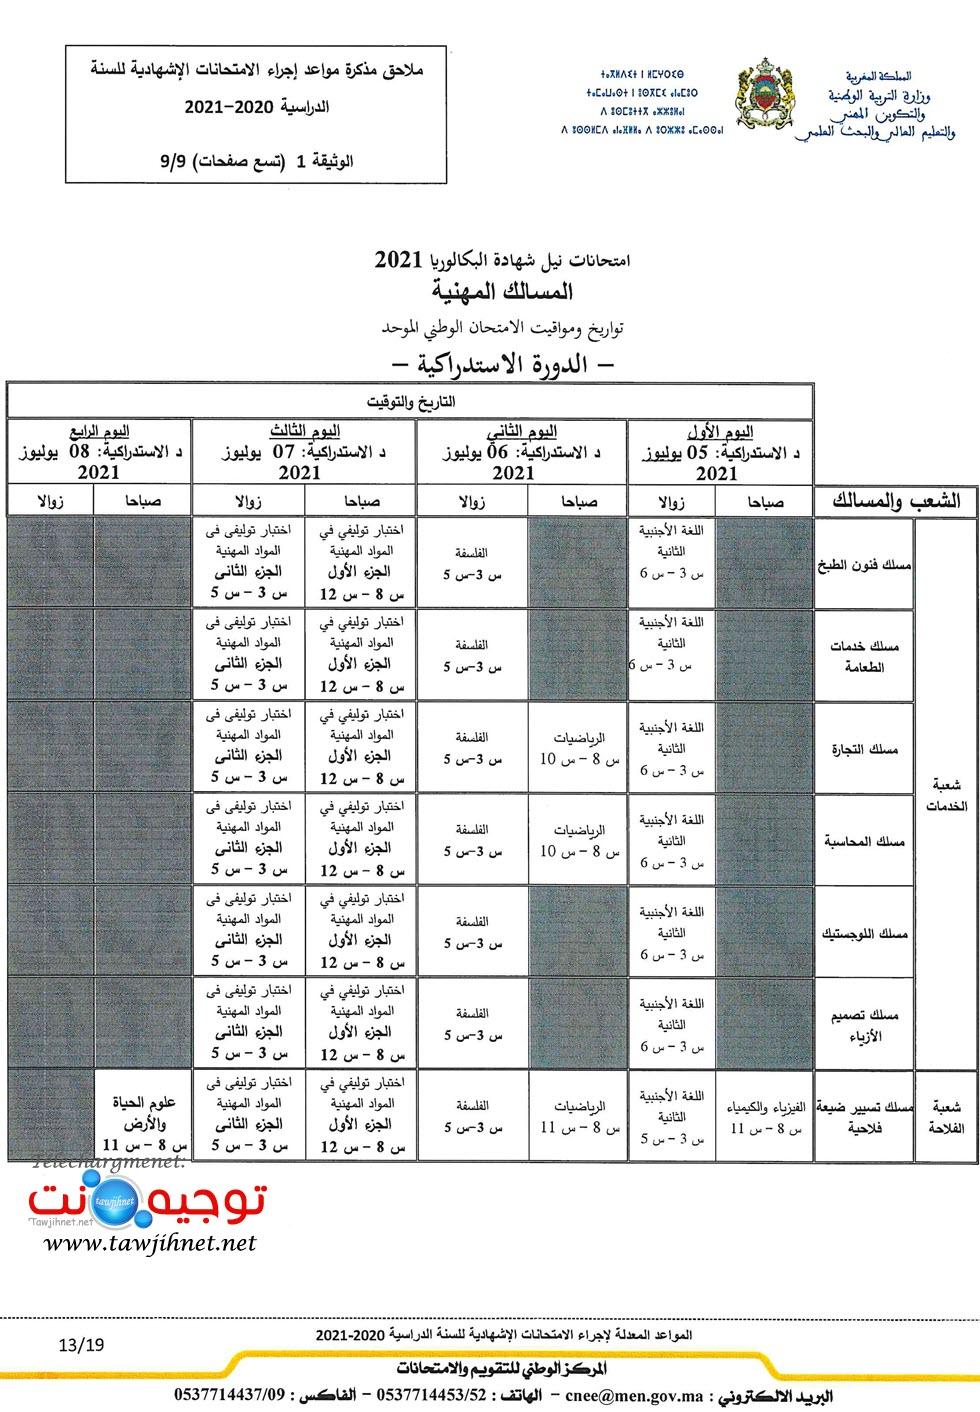 examen-2021-national-regional-provincial_Page_13.jpg